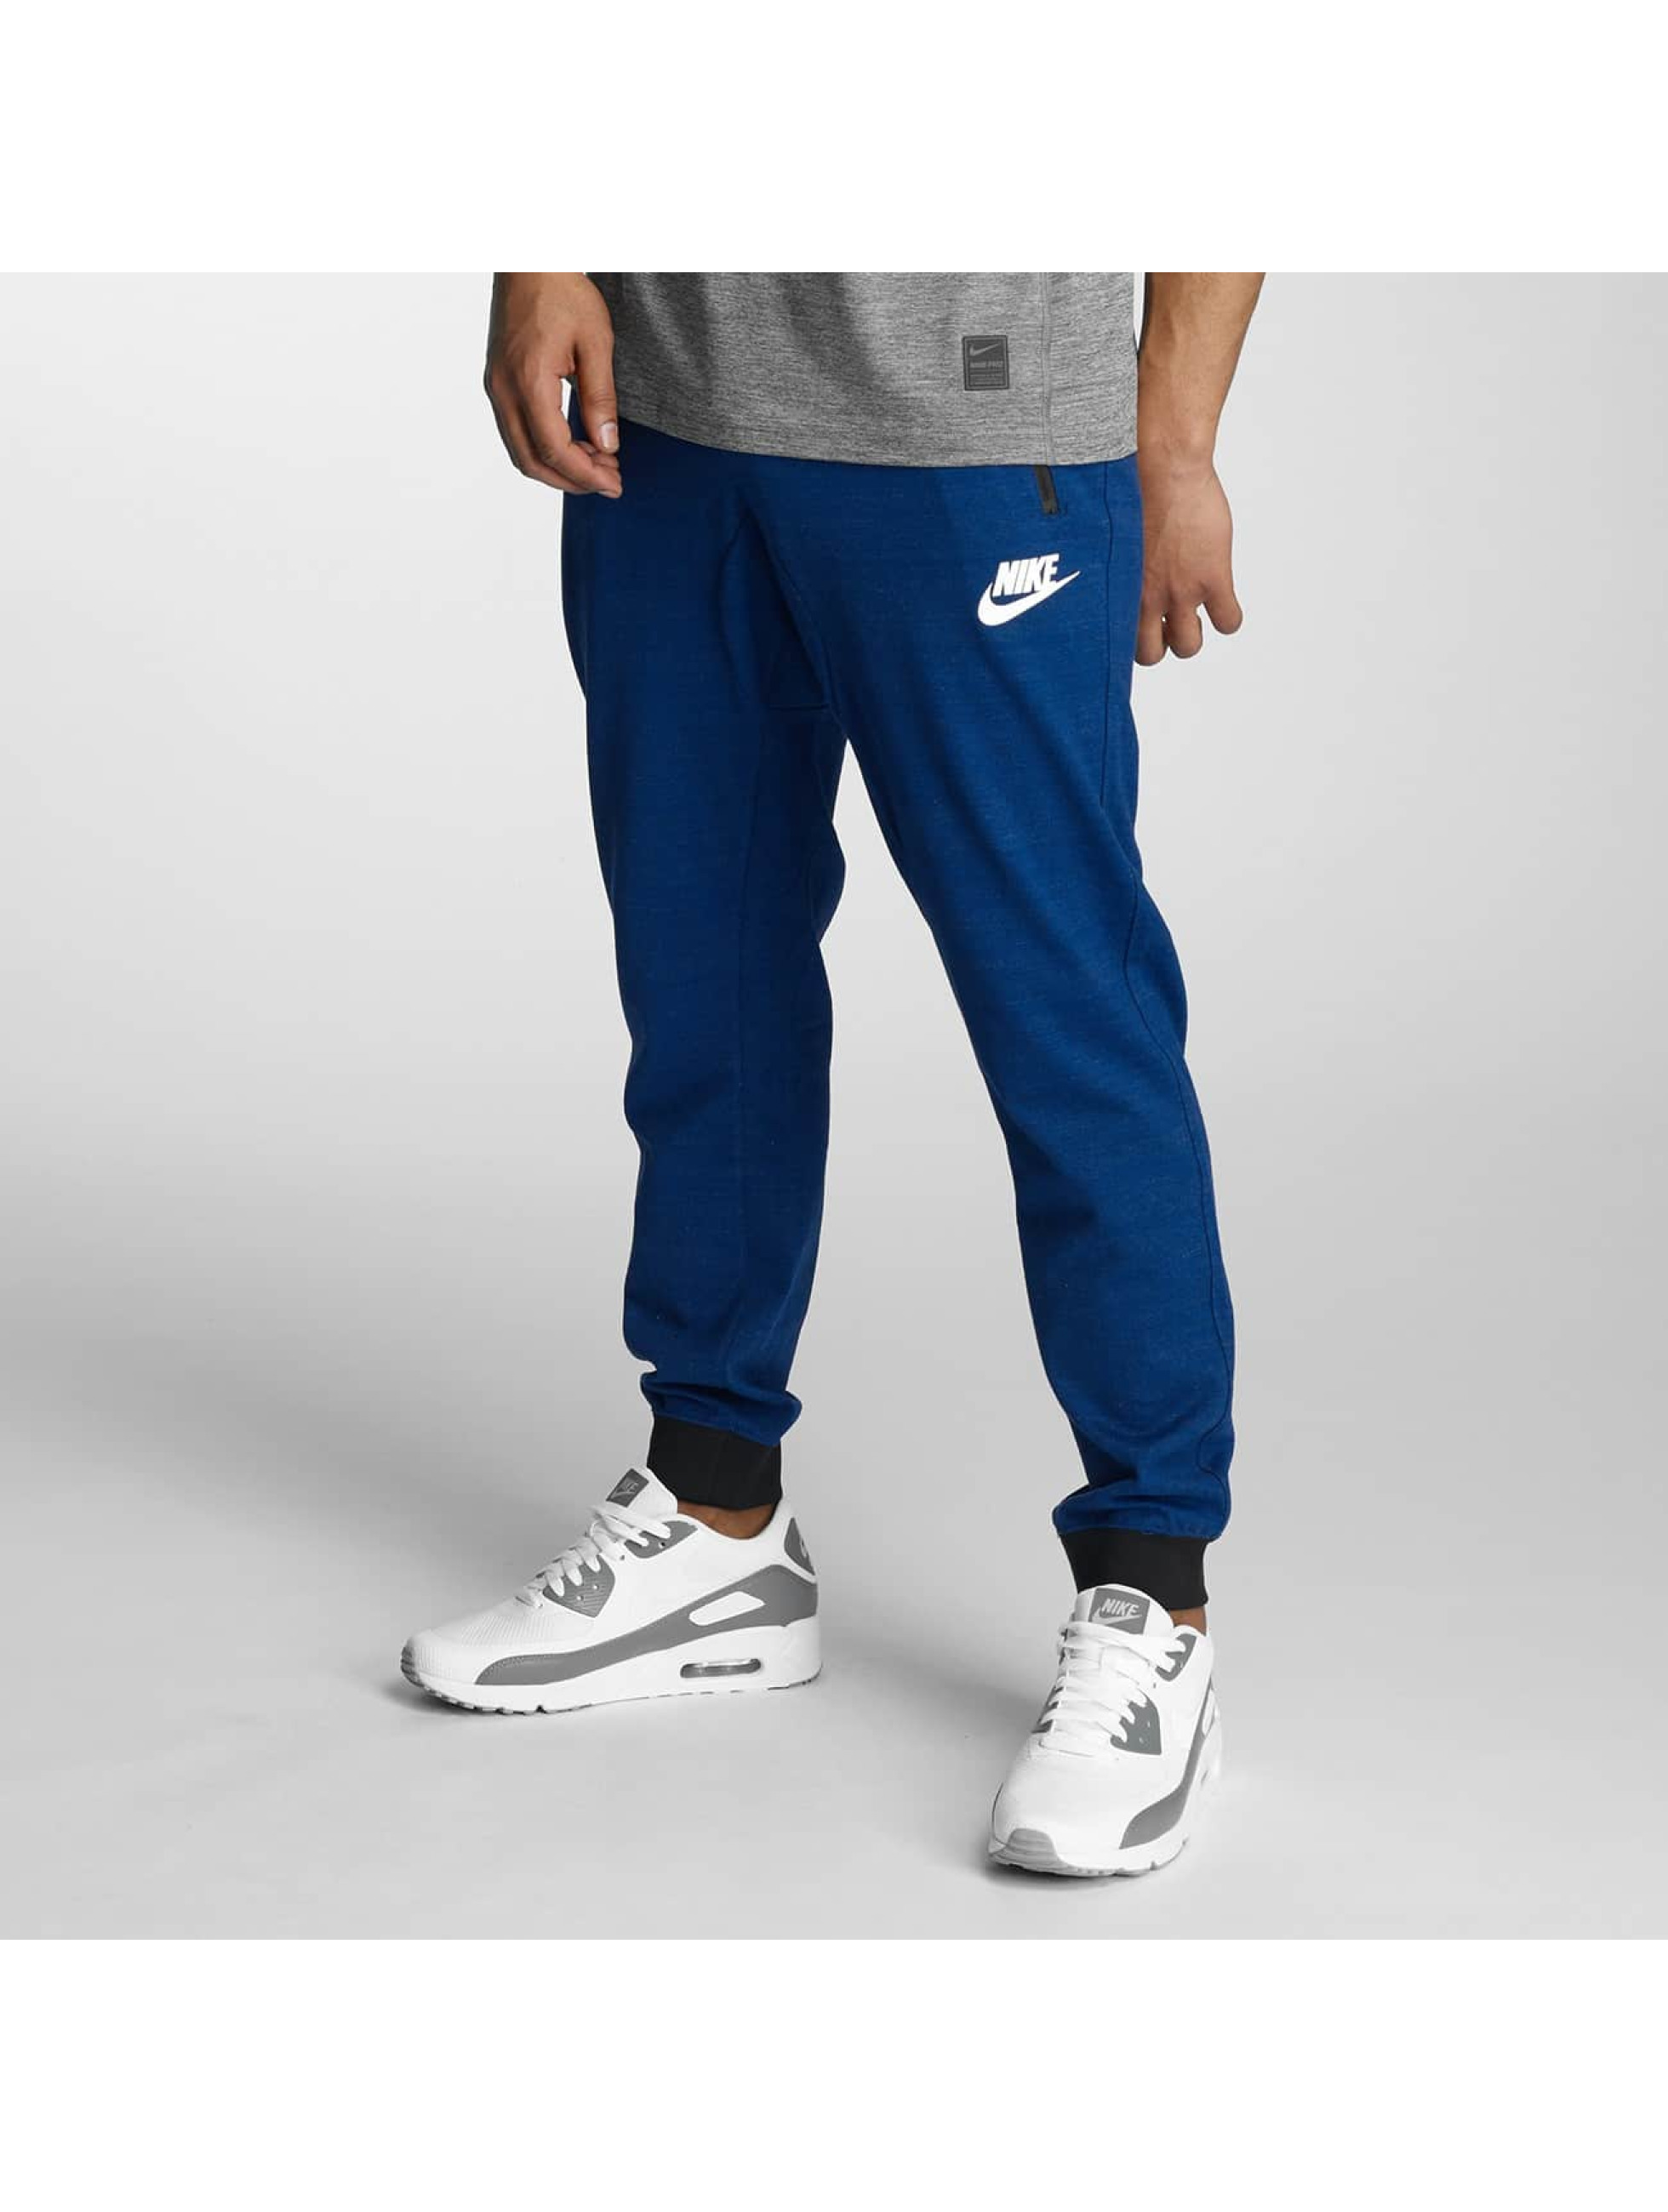 Nike tepláky Sportswear Advance 15 modrá